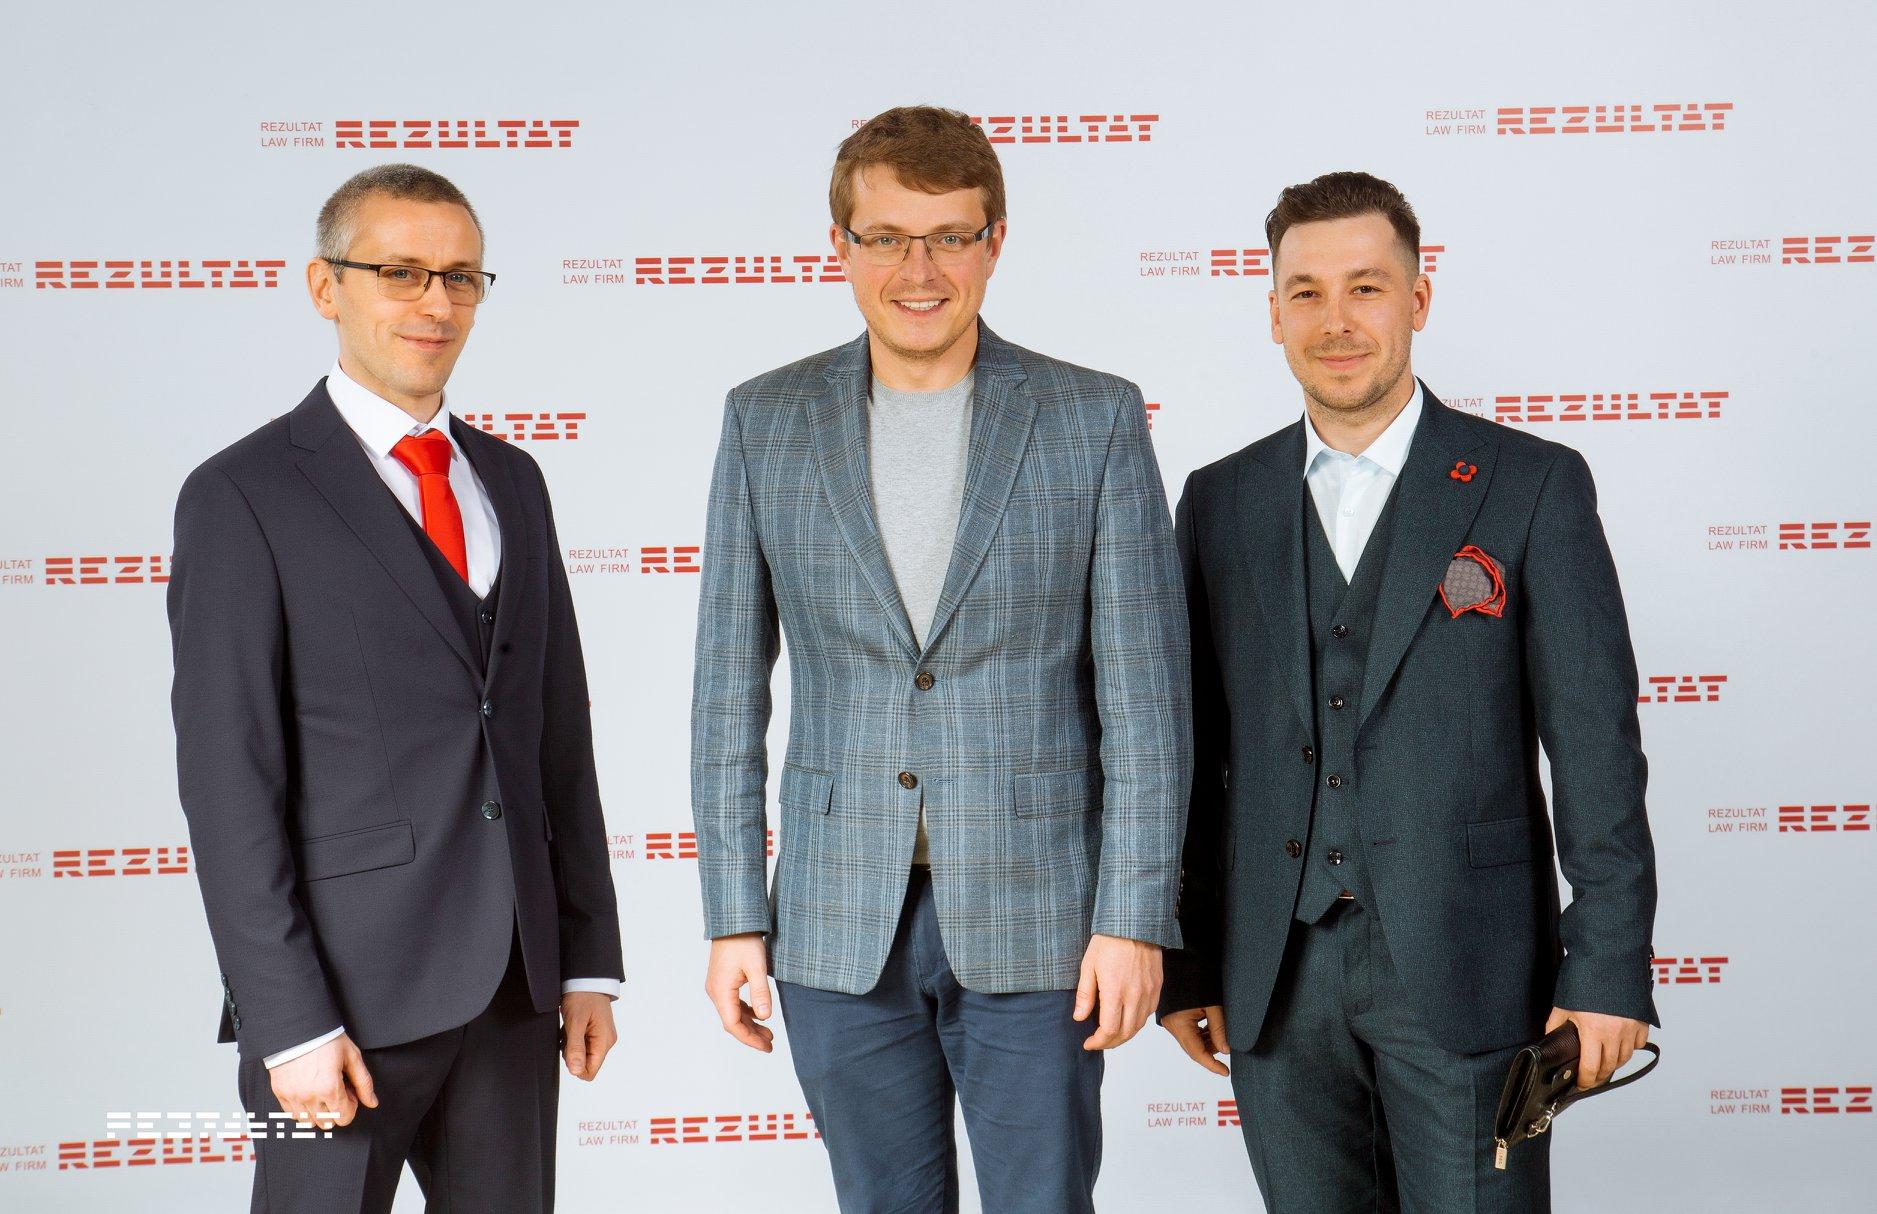 Vladyslav Golub rezultat law firm